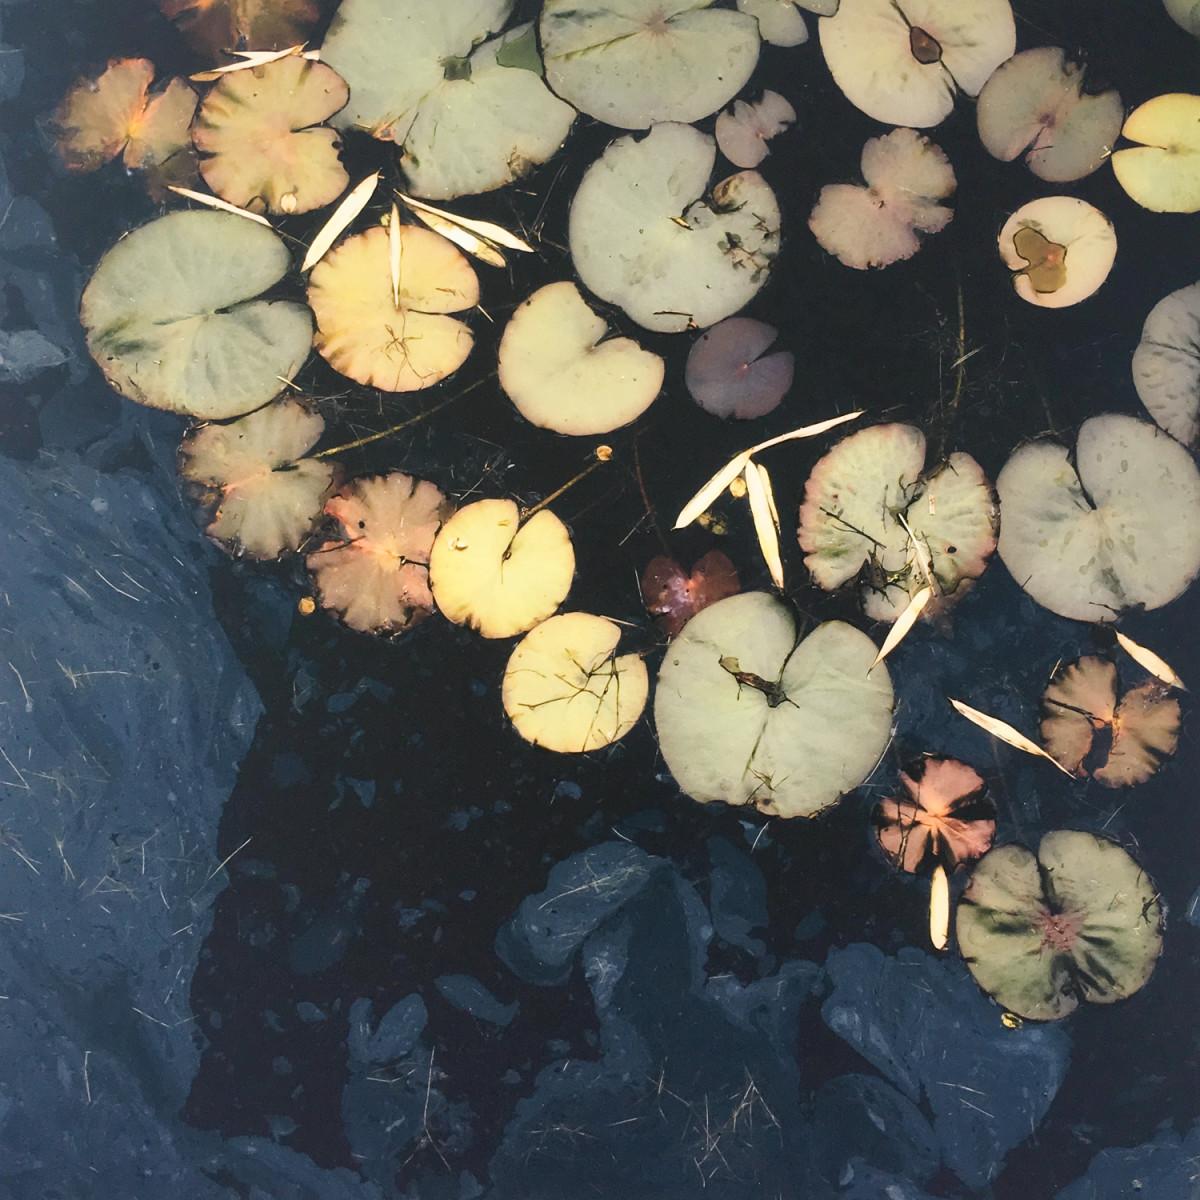 Lilies by caroline fraser